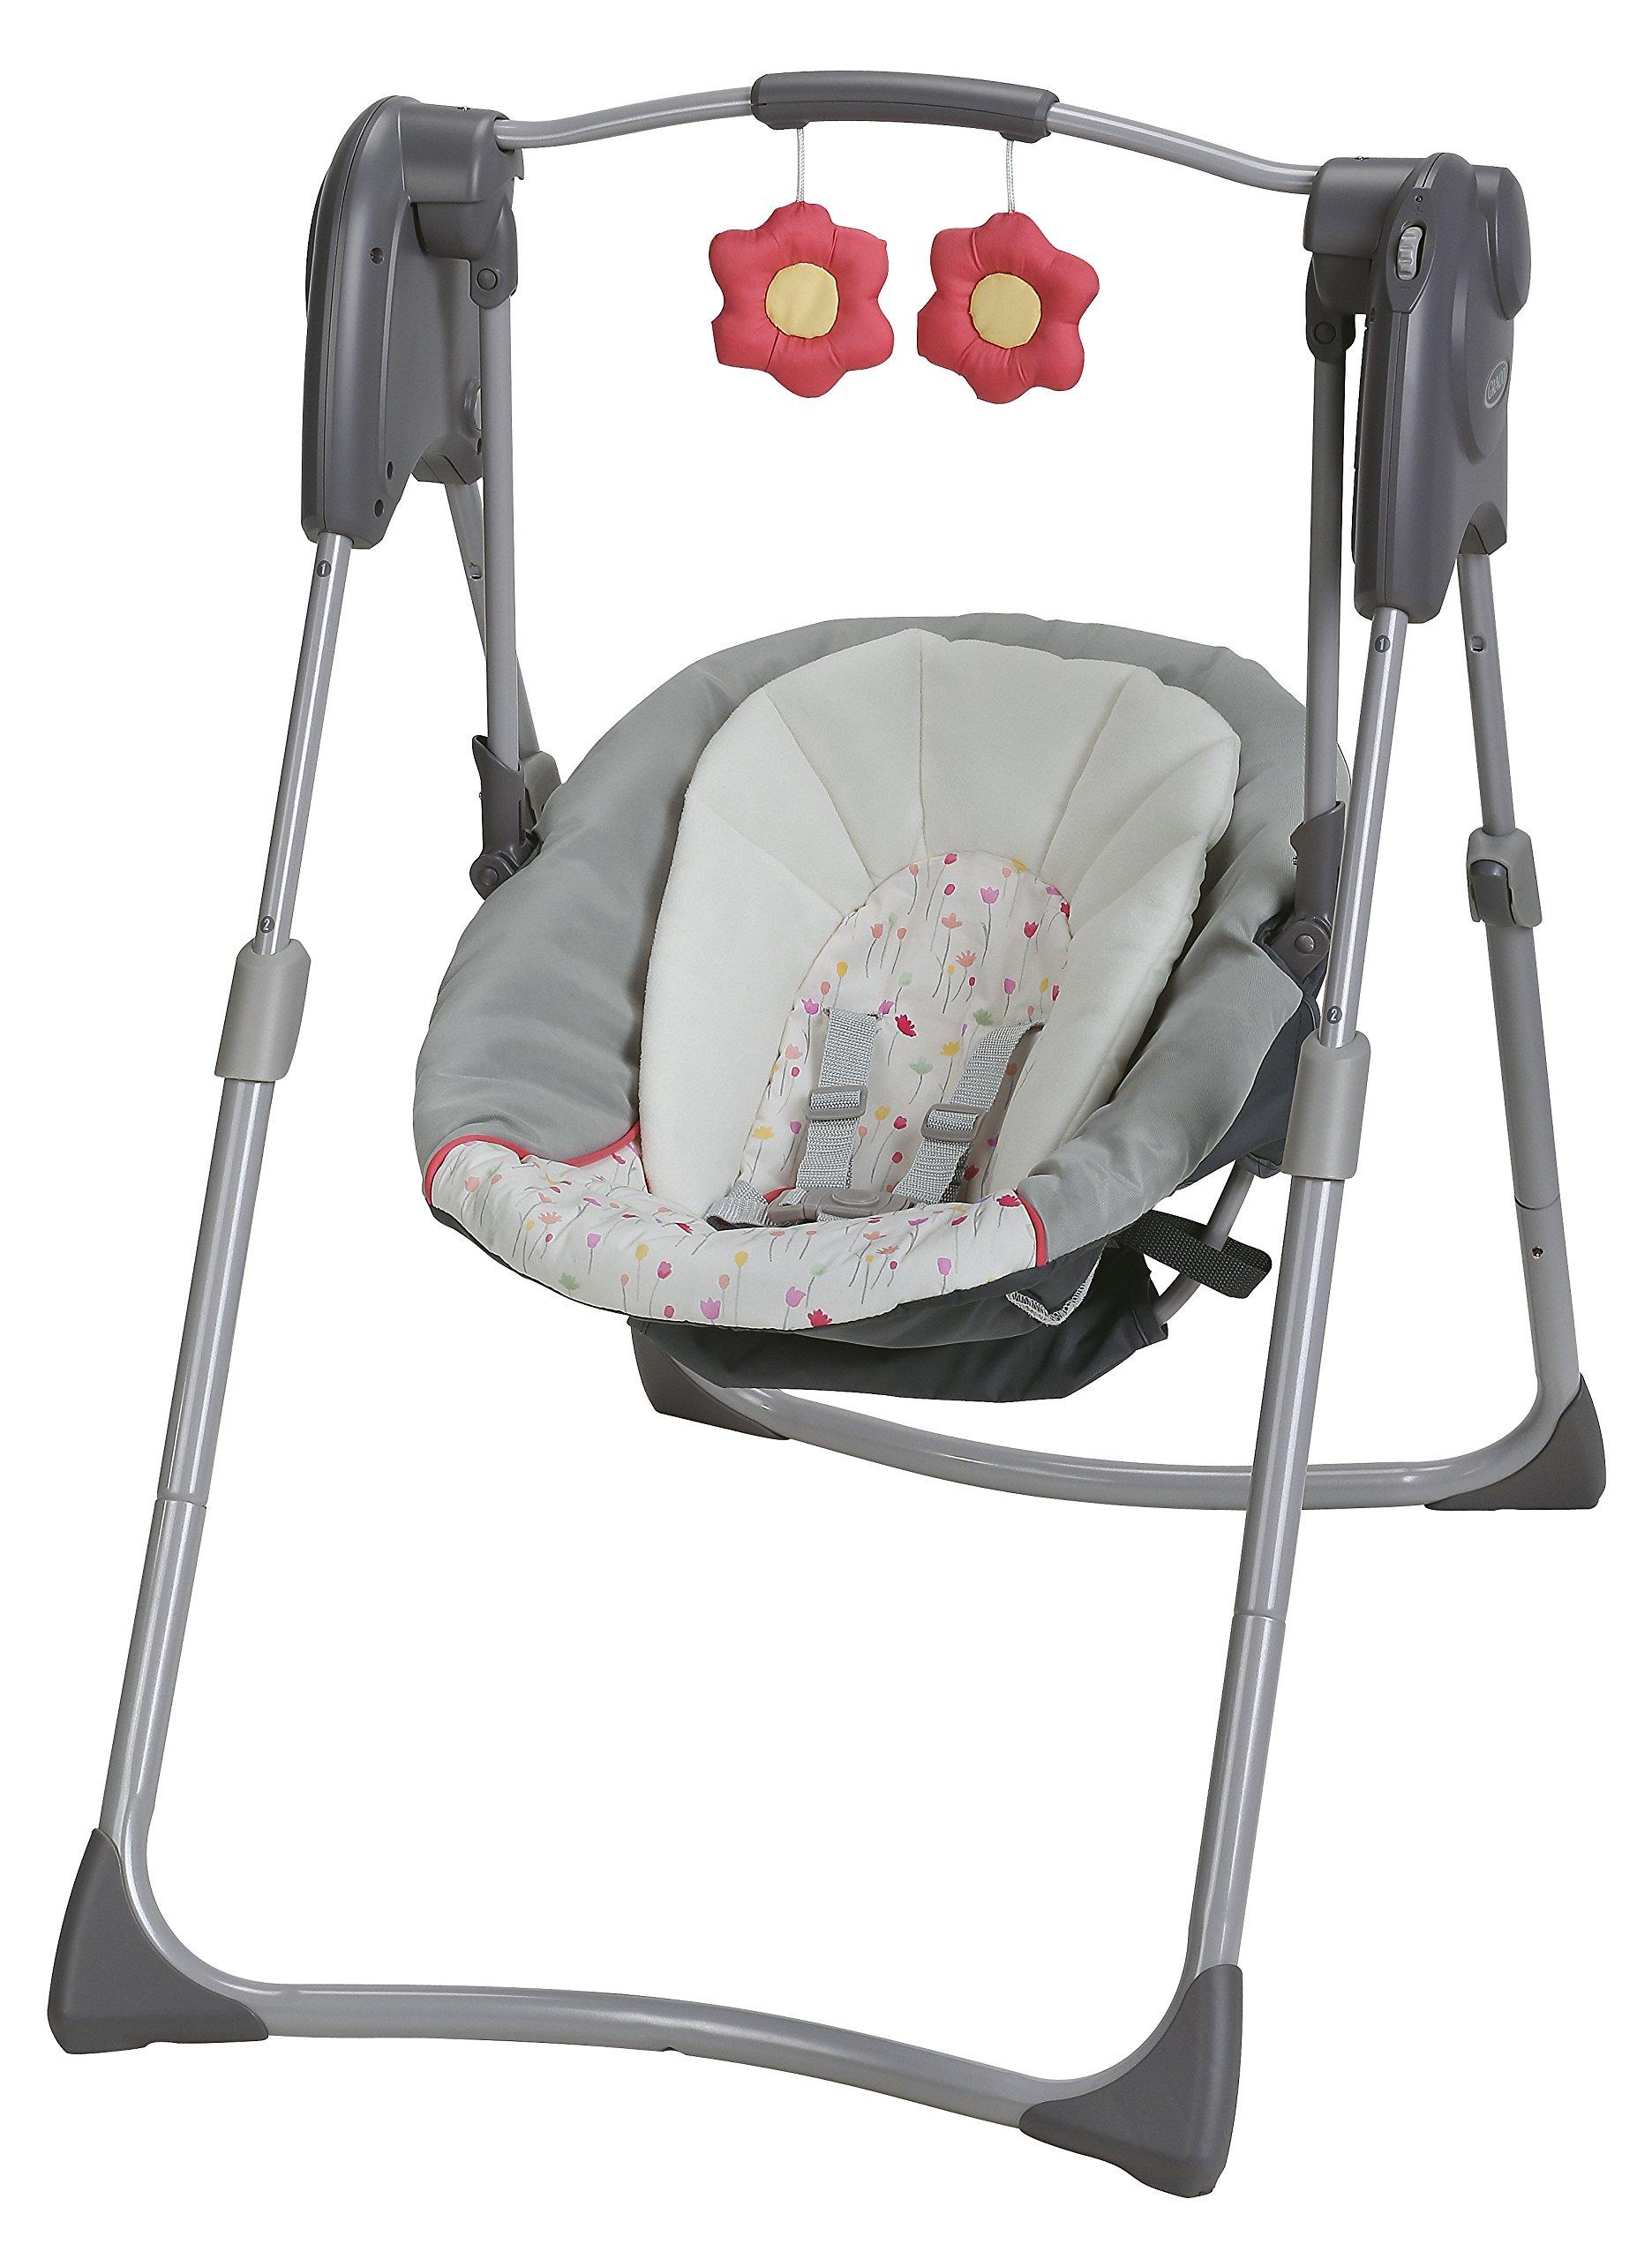 Graco Slim Spaces Compact Baby Swing, Alma